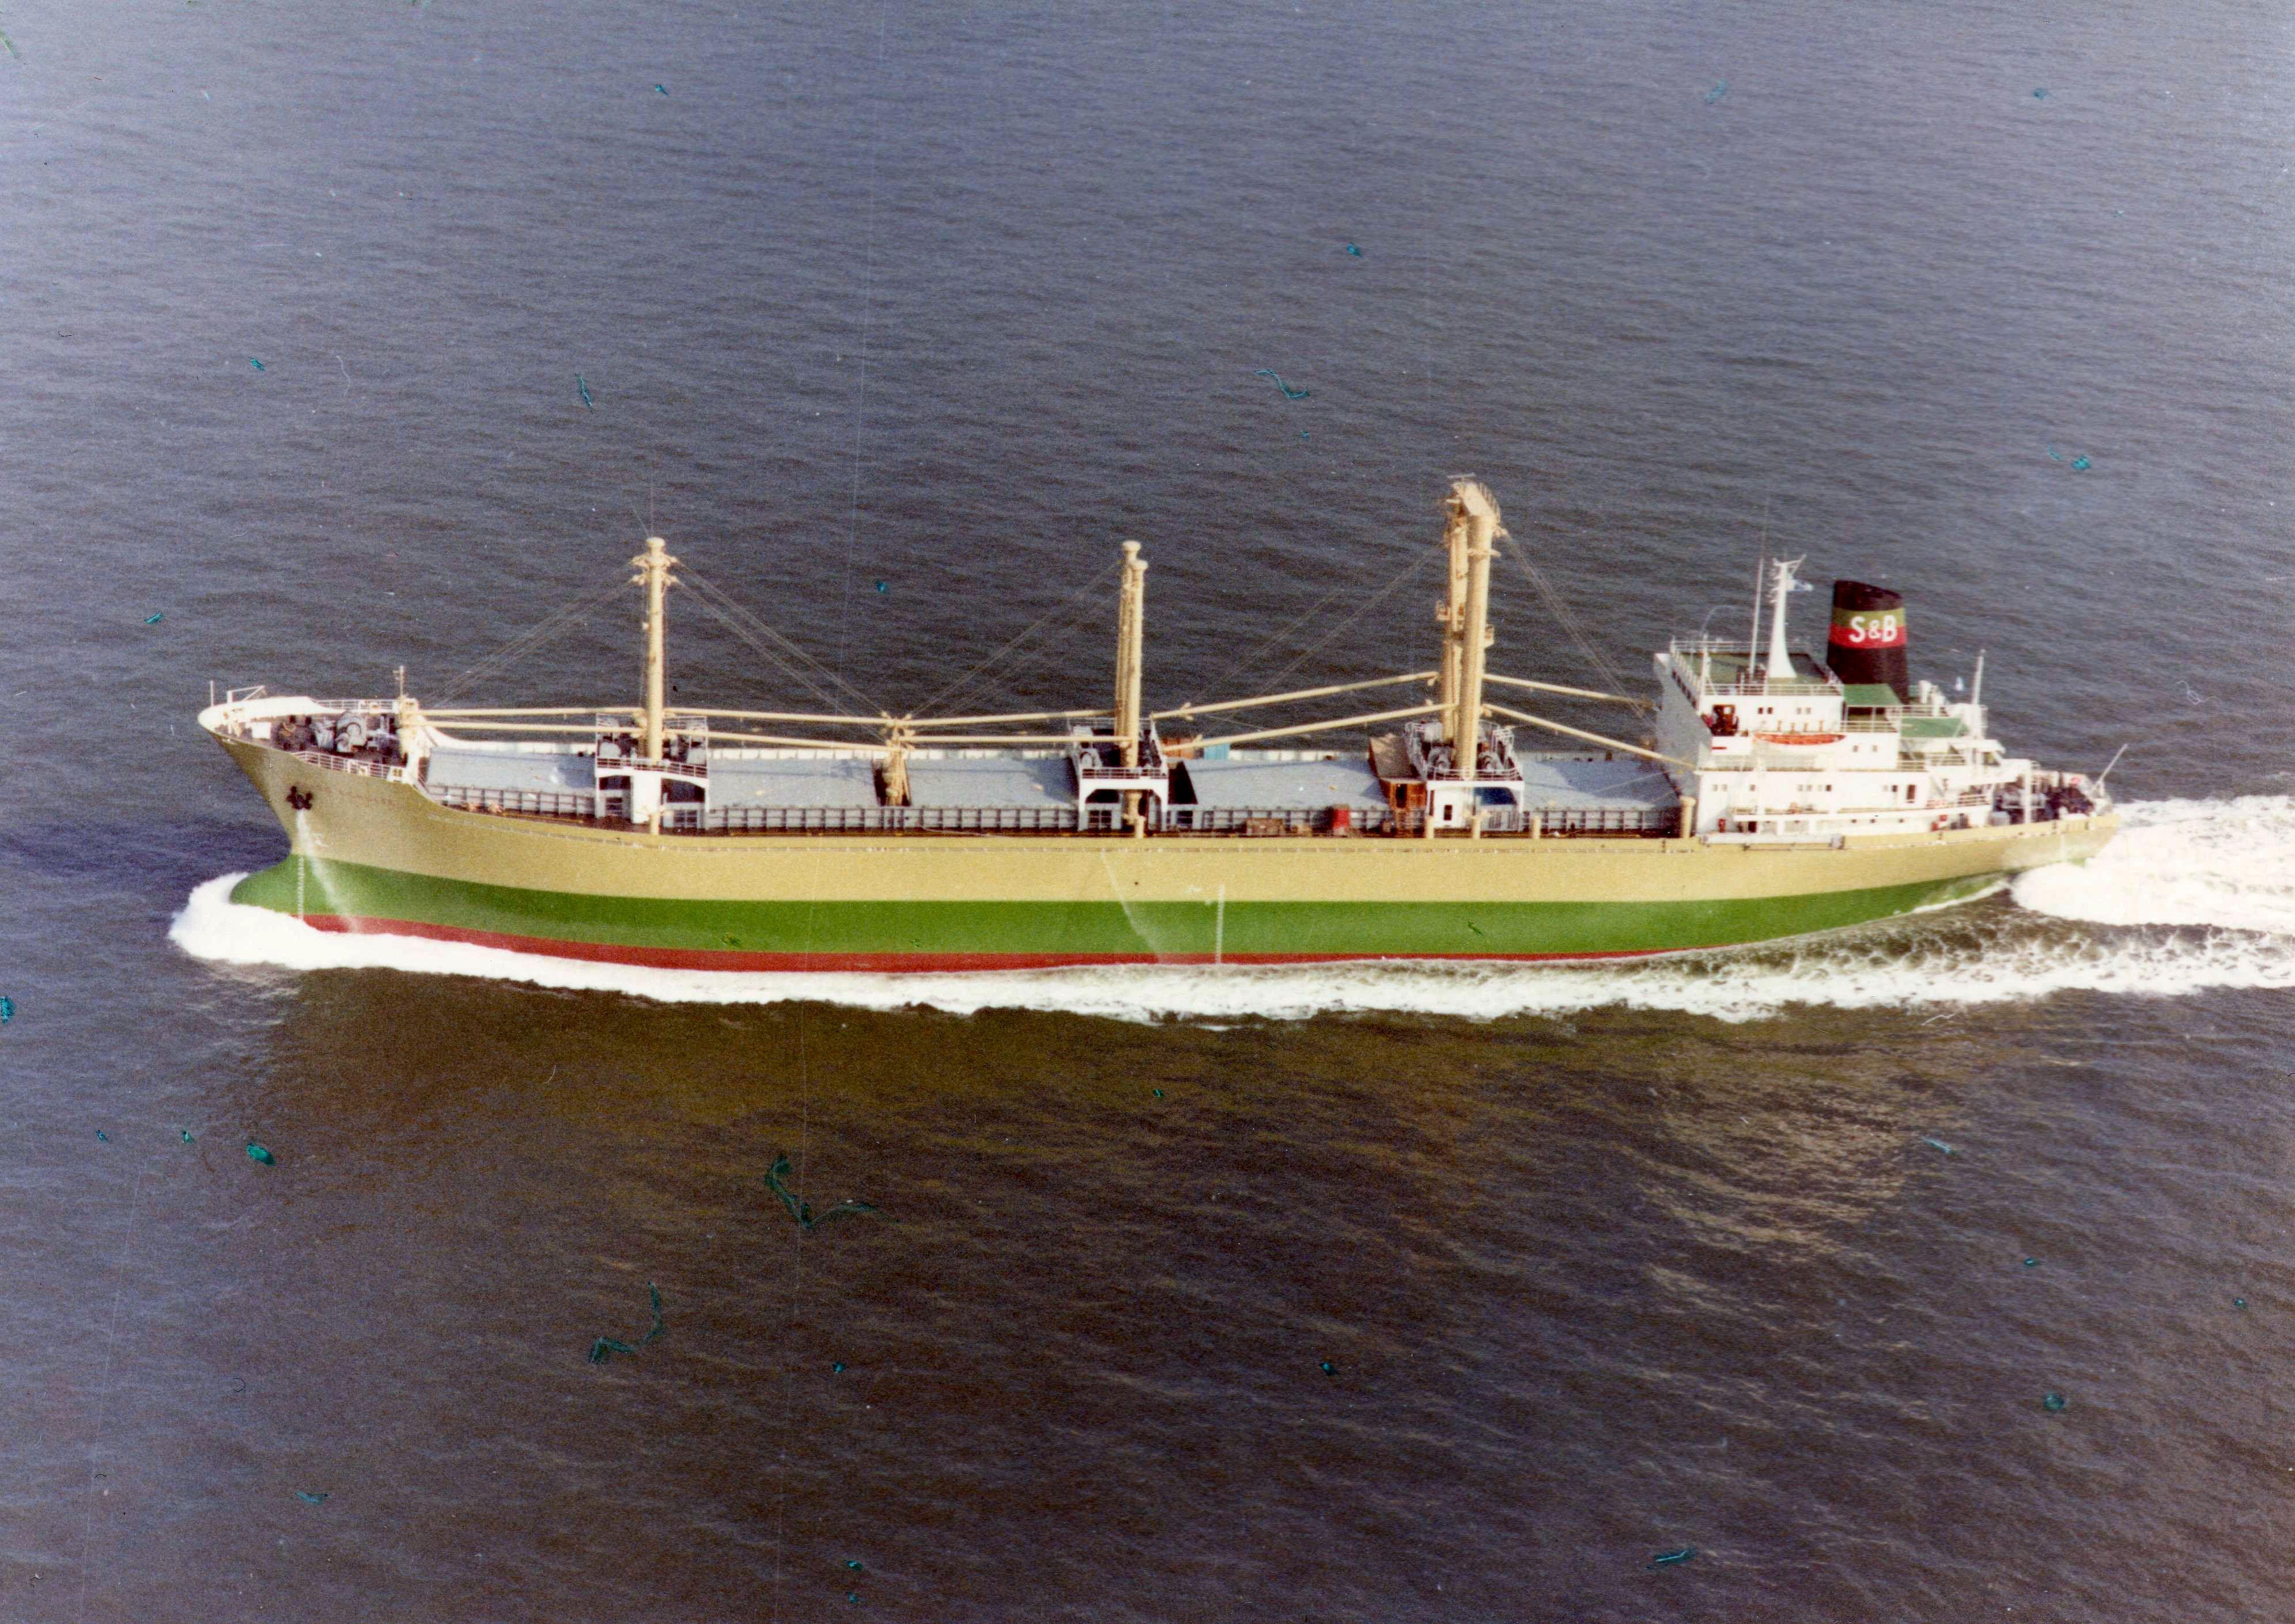 1973 ELISE SCHULTE 01-2 (SUSANNE VINNEN-CONCORDIA MOON-PASSAT-AMER JYOTI-SPINOZA) 1999 Alang (969)